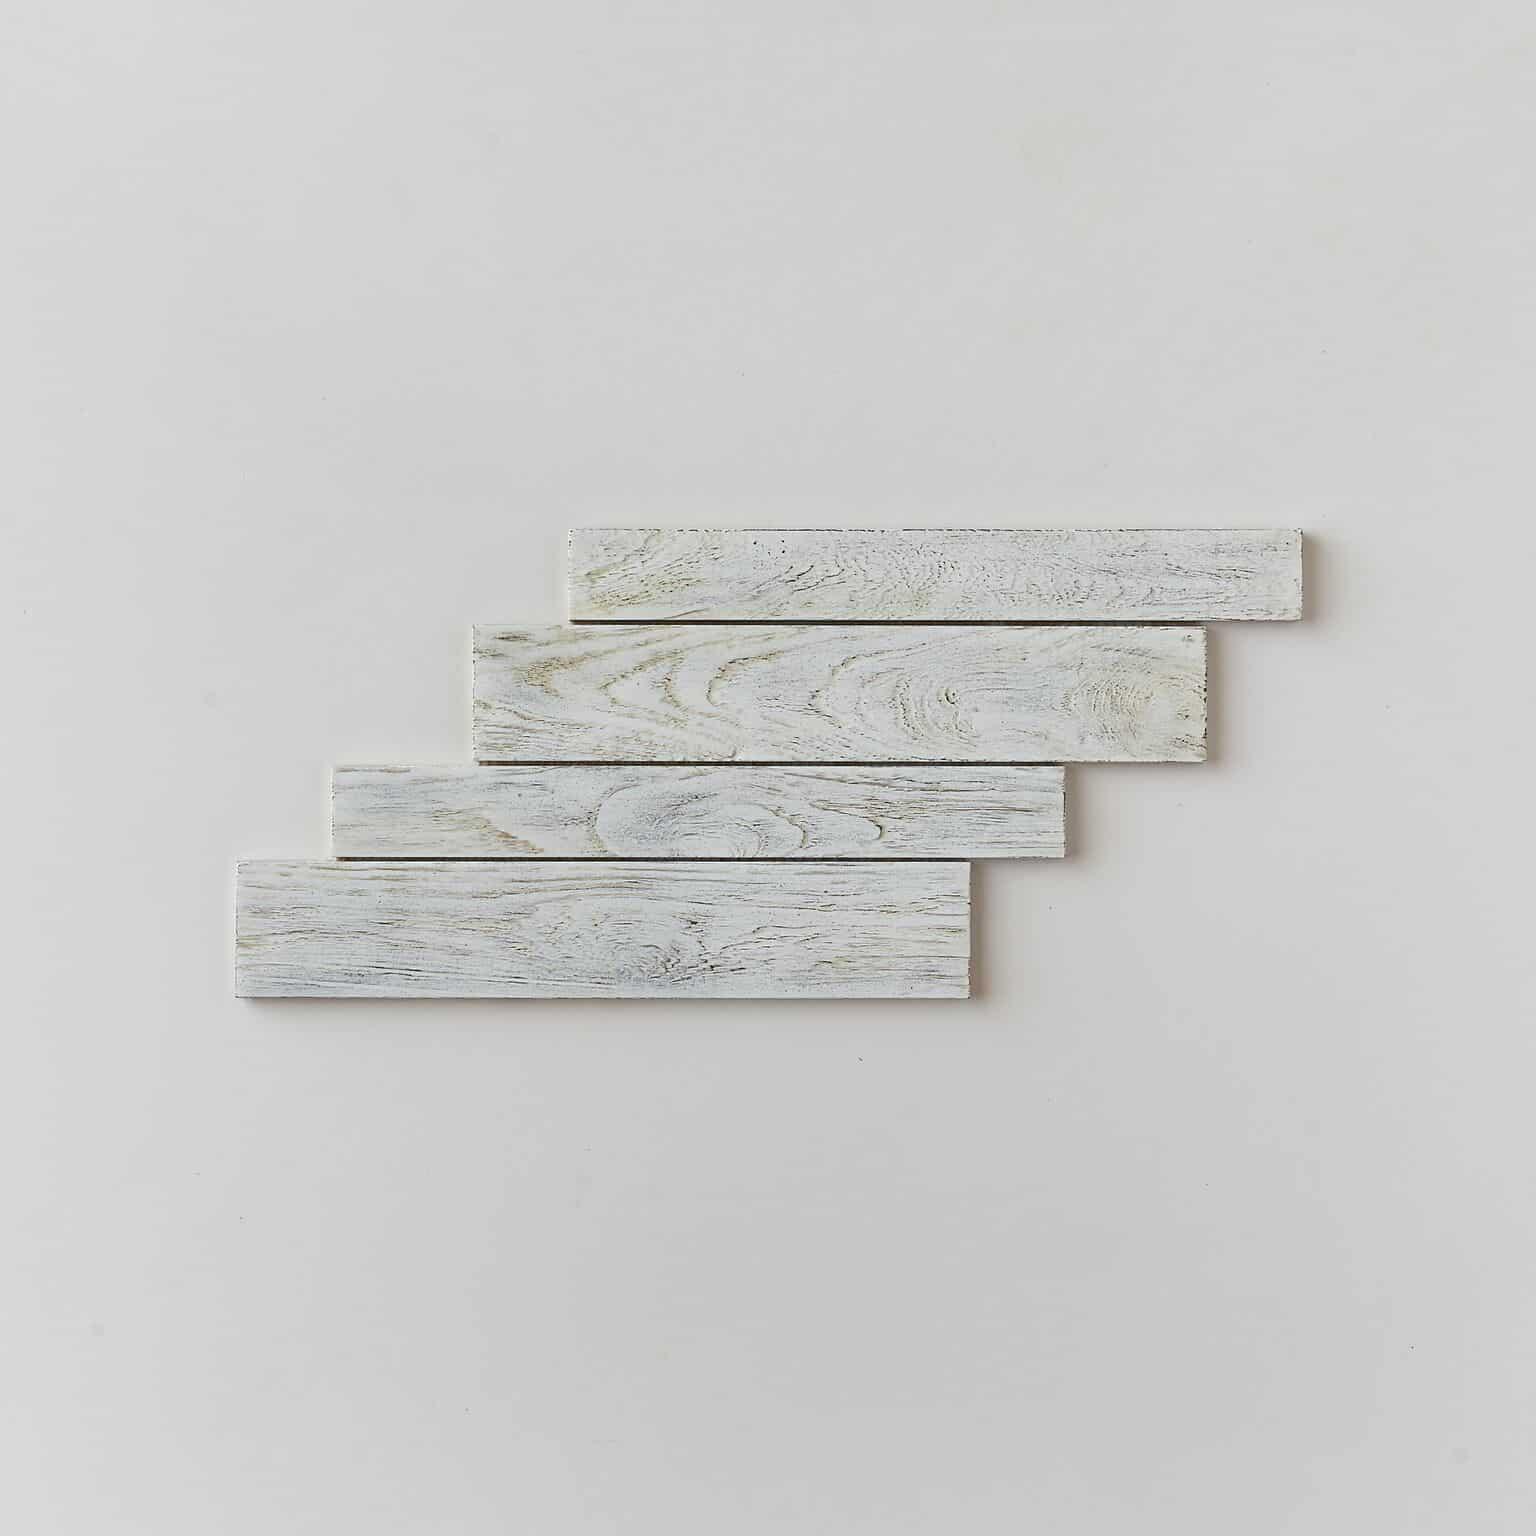 unspecified 21 - Teak Tile - Herringbone